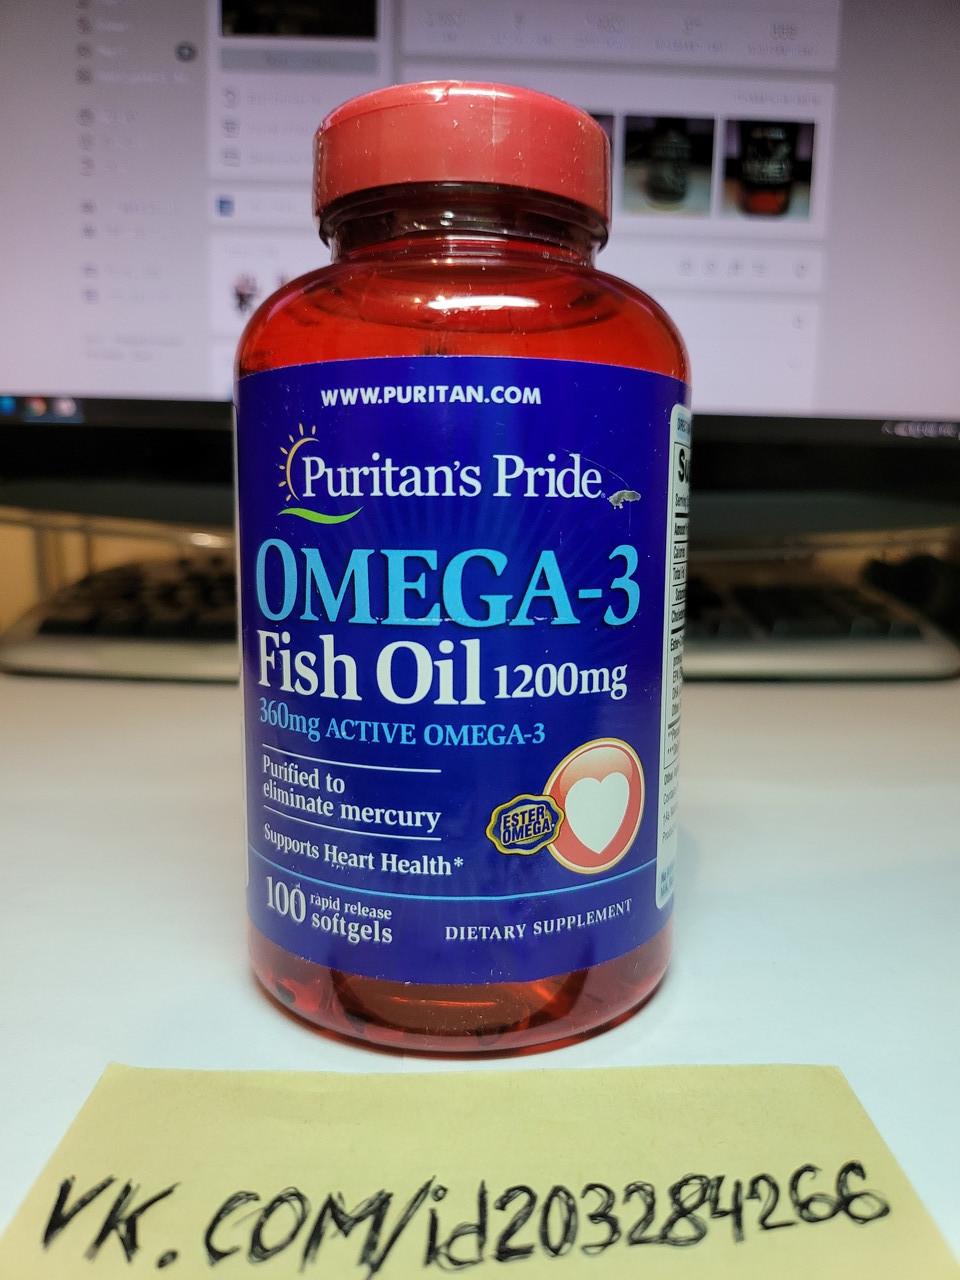 Омега 3 Puritan's Pride Omega-3 Fish Oil 1200 mg 100 softgels пуританс прайд рыбий жир жирные кислоты витамины